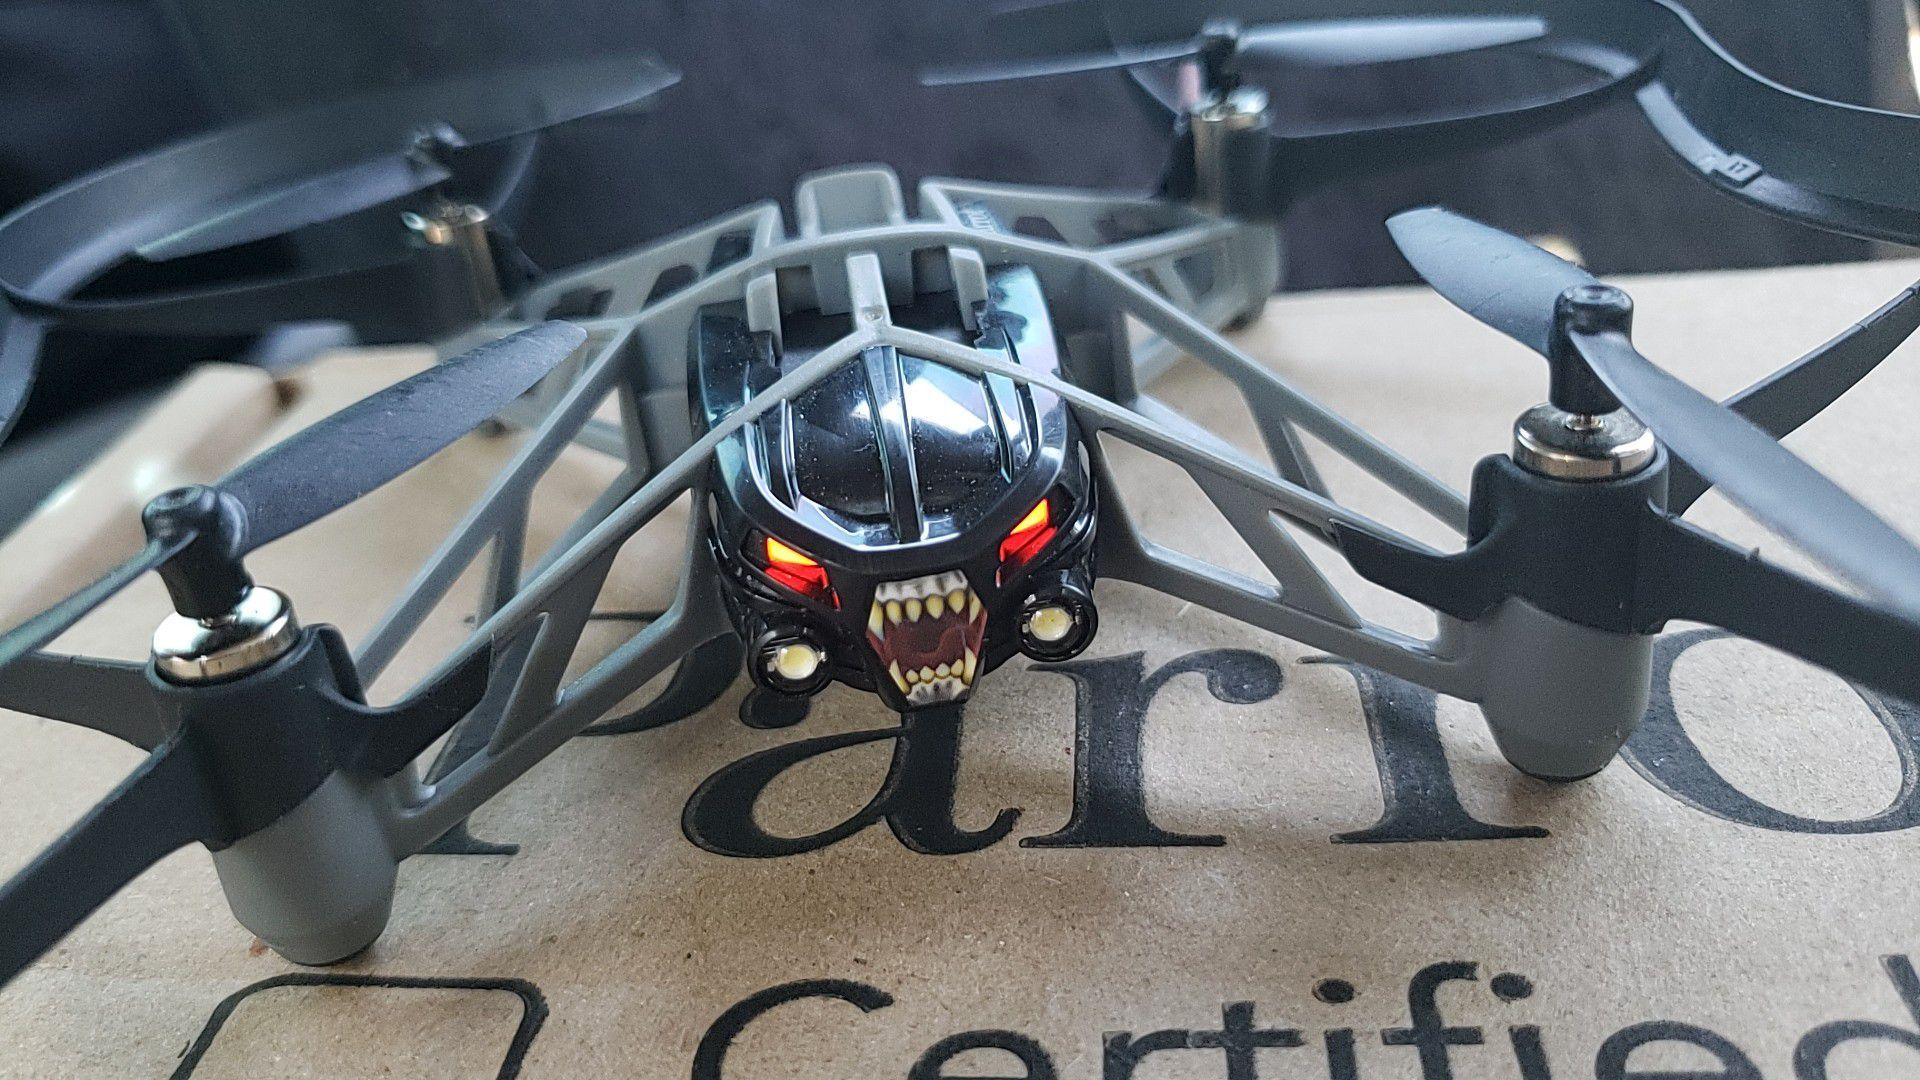 Parrot mini drone (S.W.A.T)